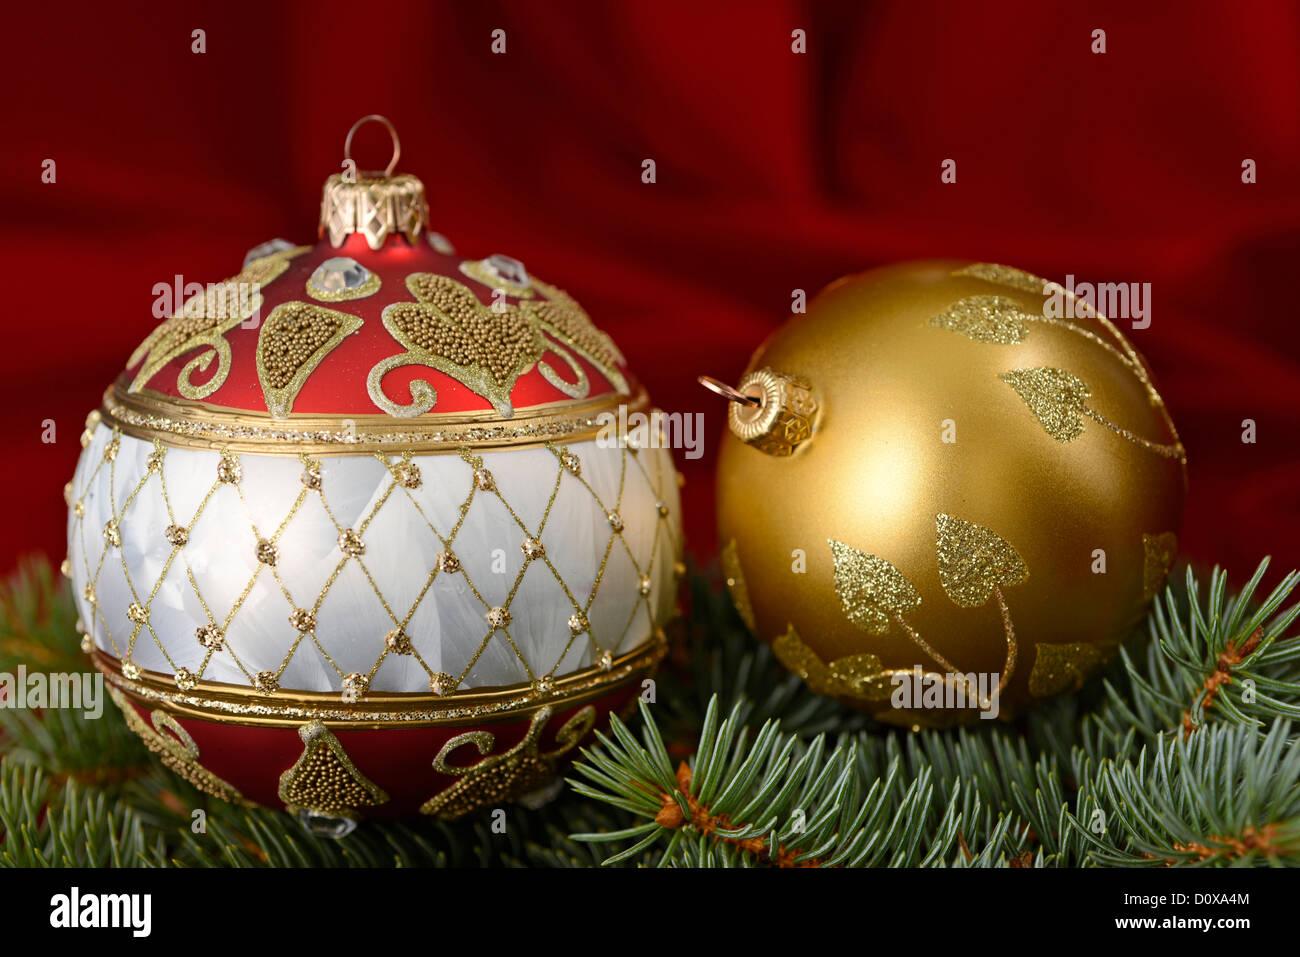 Christmas Ornaments - Stock Image